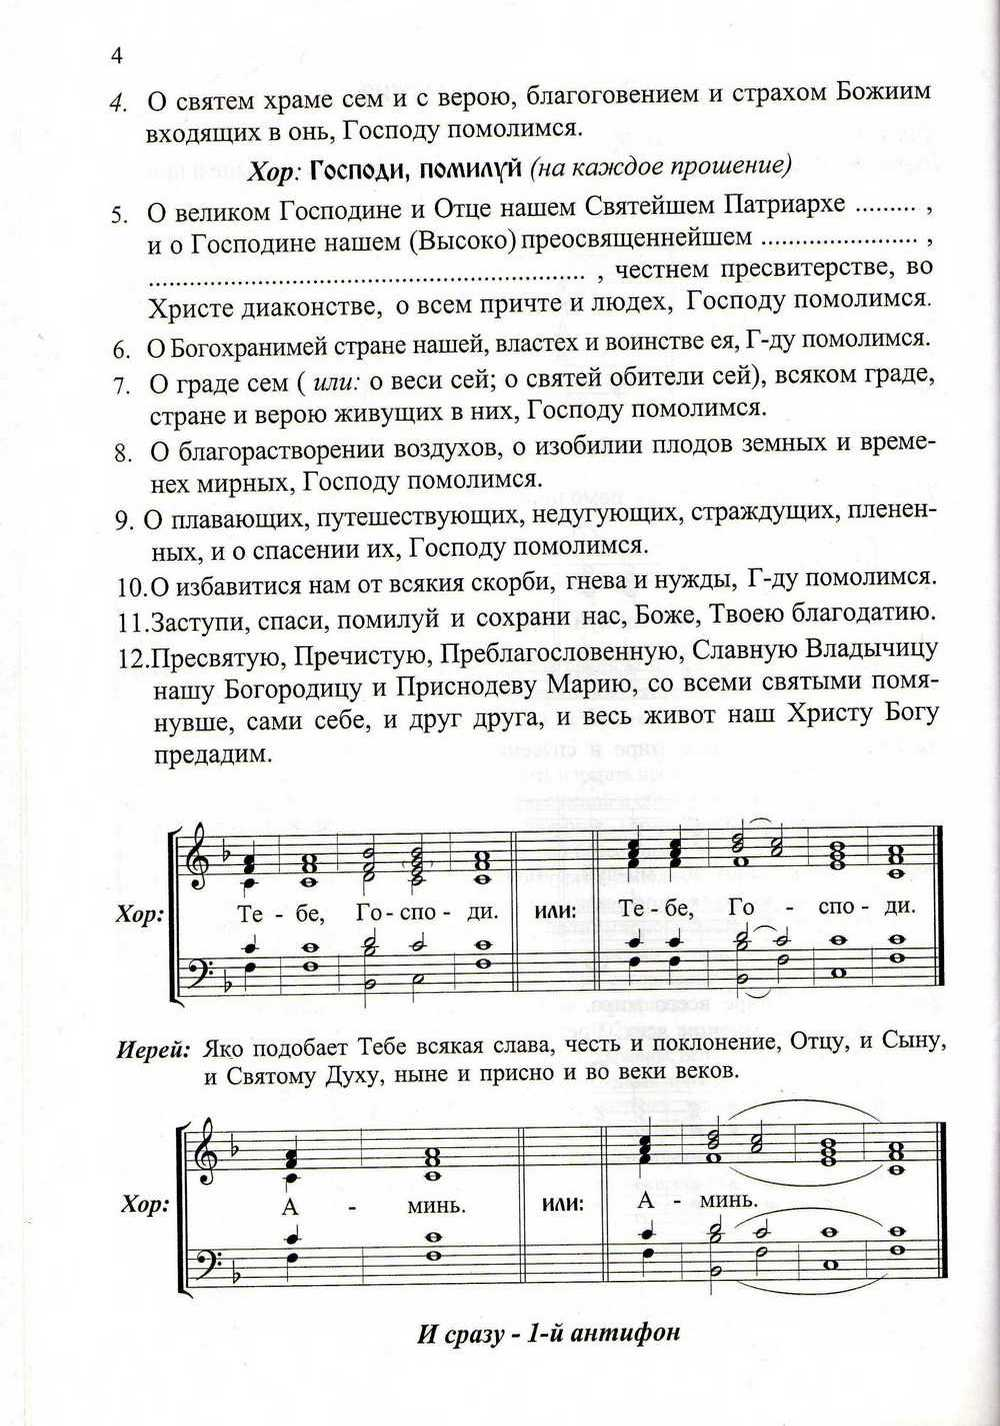 http://i2.imageban.ru/out/2013/09/24/d32a0685a45dd61a70a3f9efaee04bd4.jpg